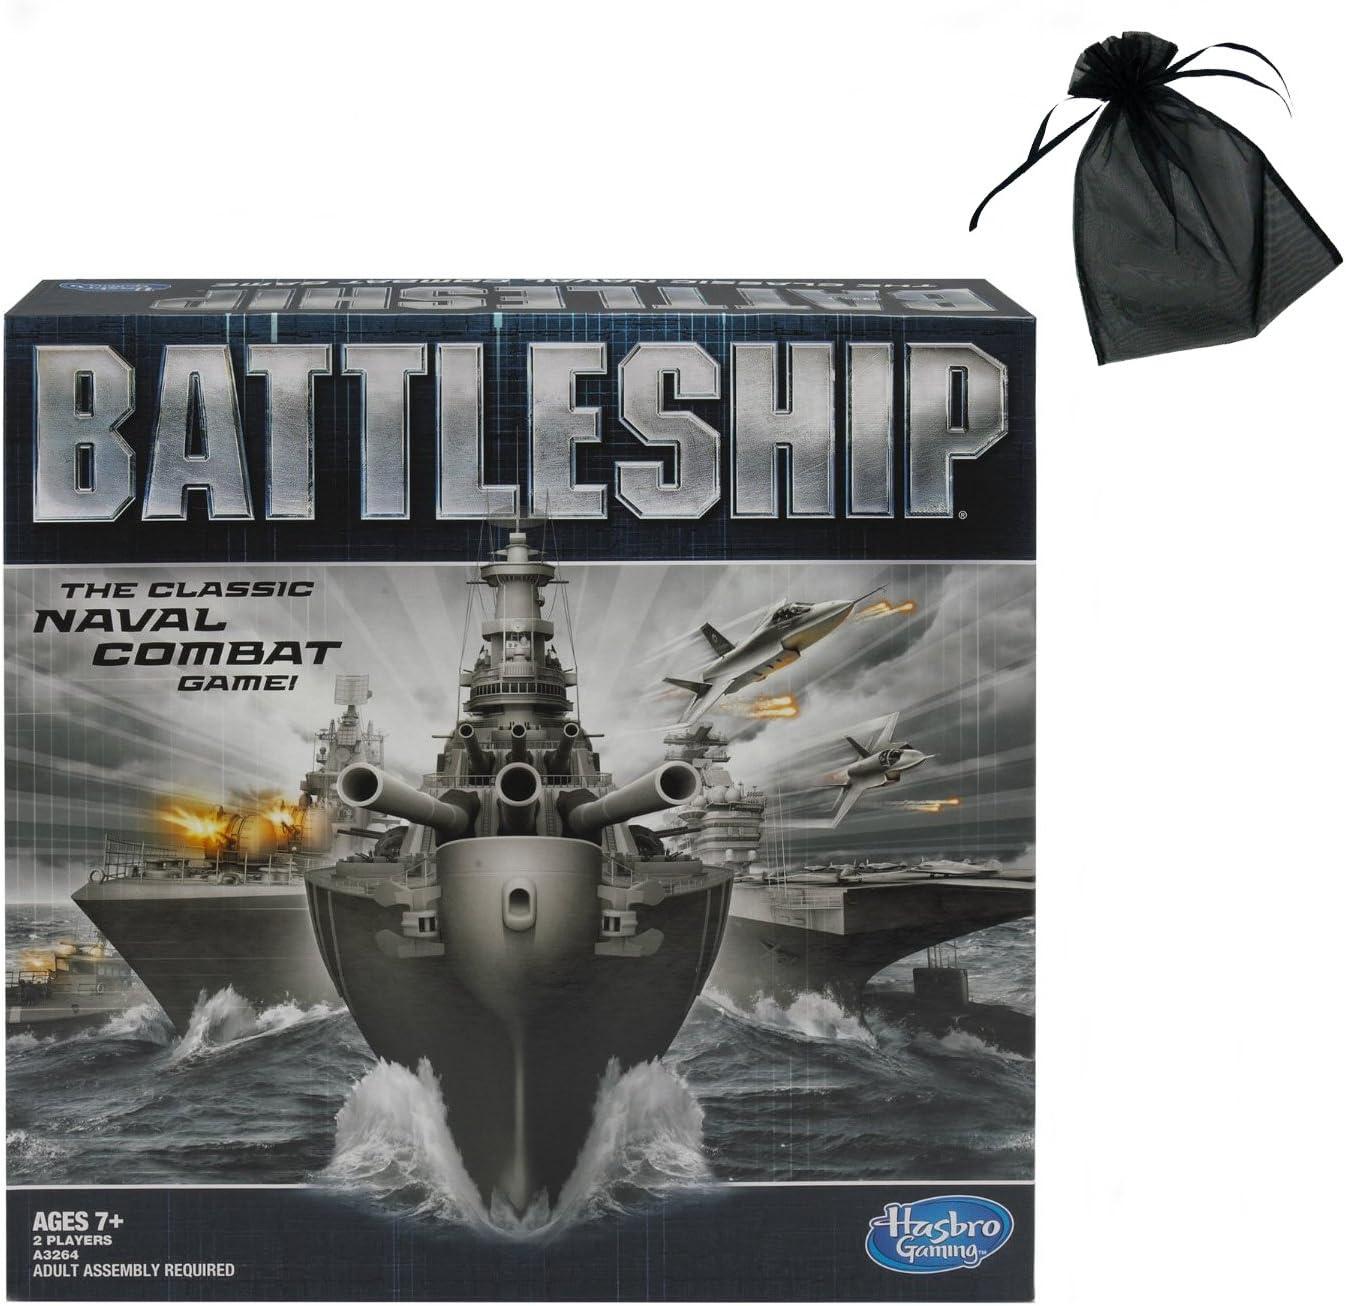 Battleship Game classic board hasbro naval combat multi player strategy new gift